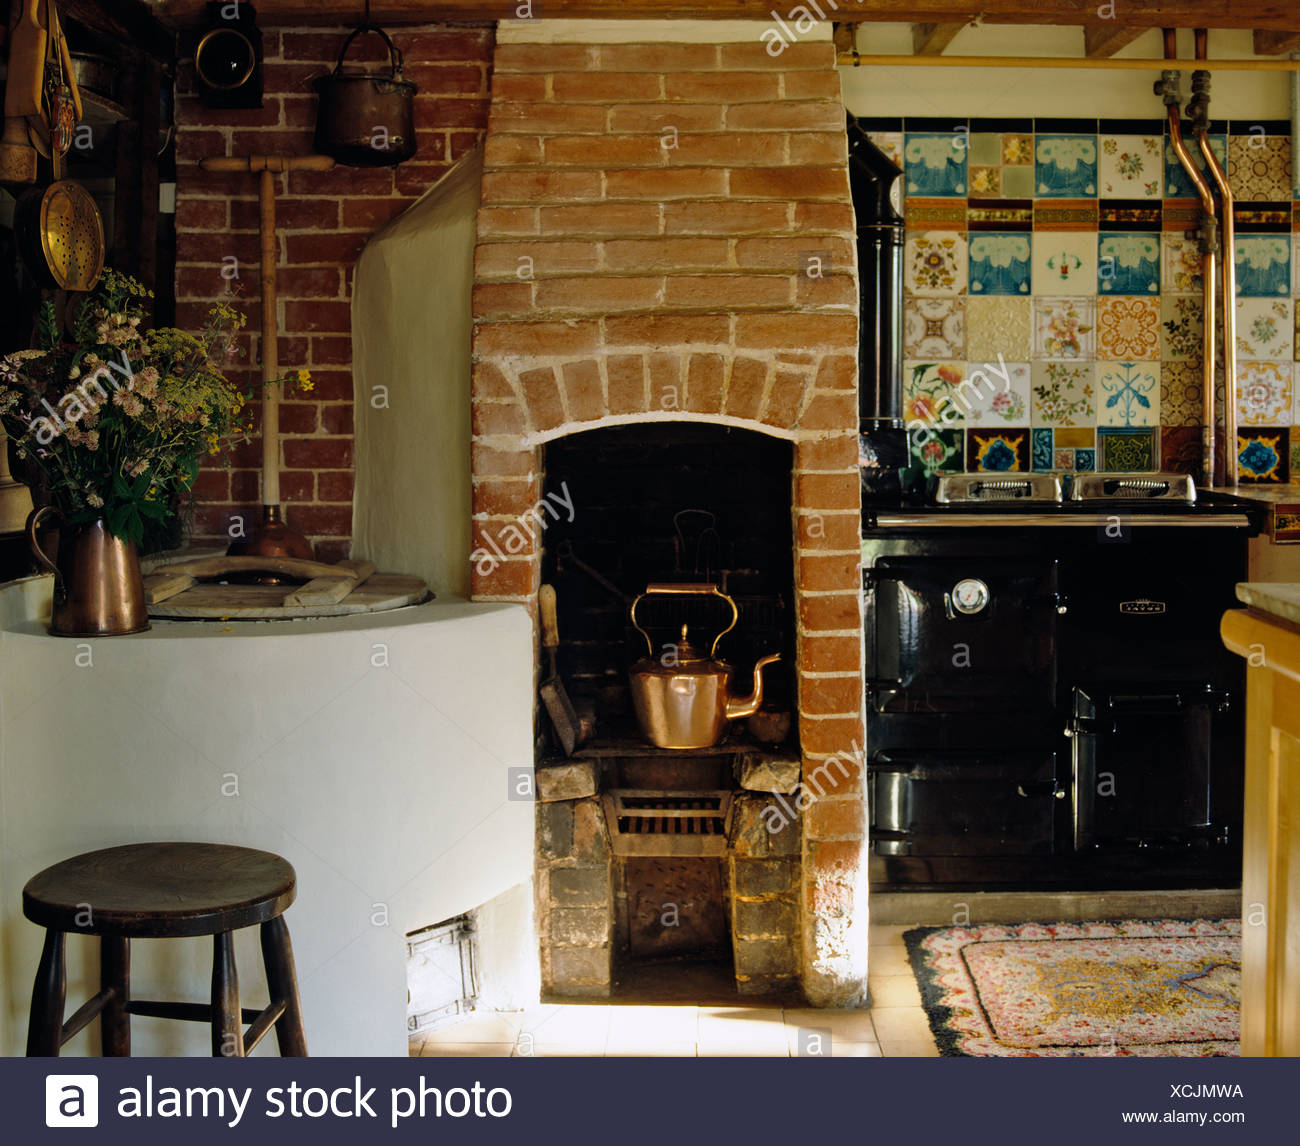 Victorian Kitchen Range Stock Photos & Victorian Kitchen